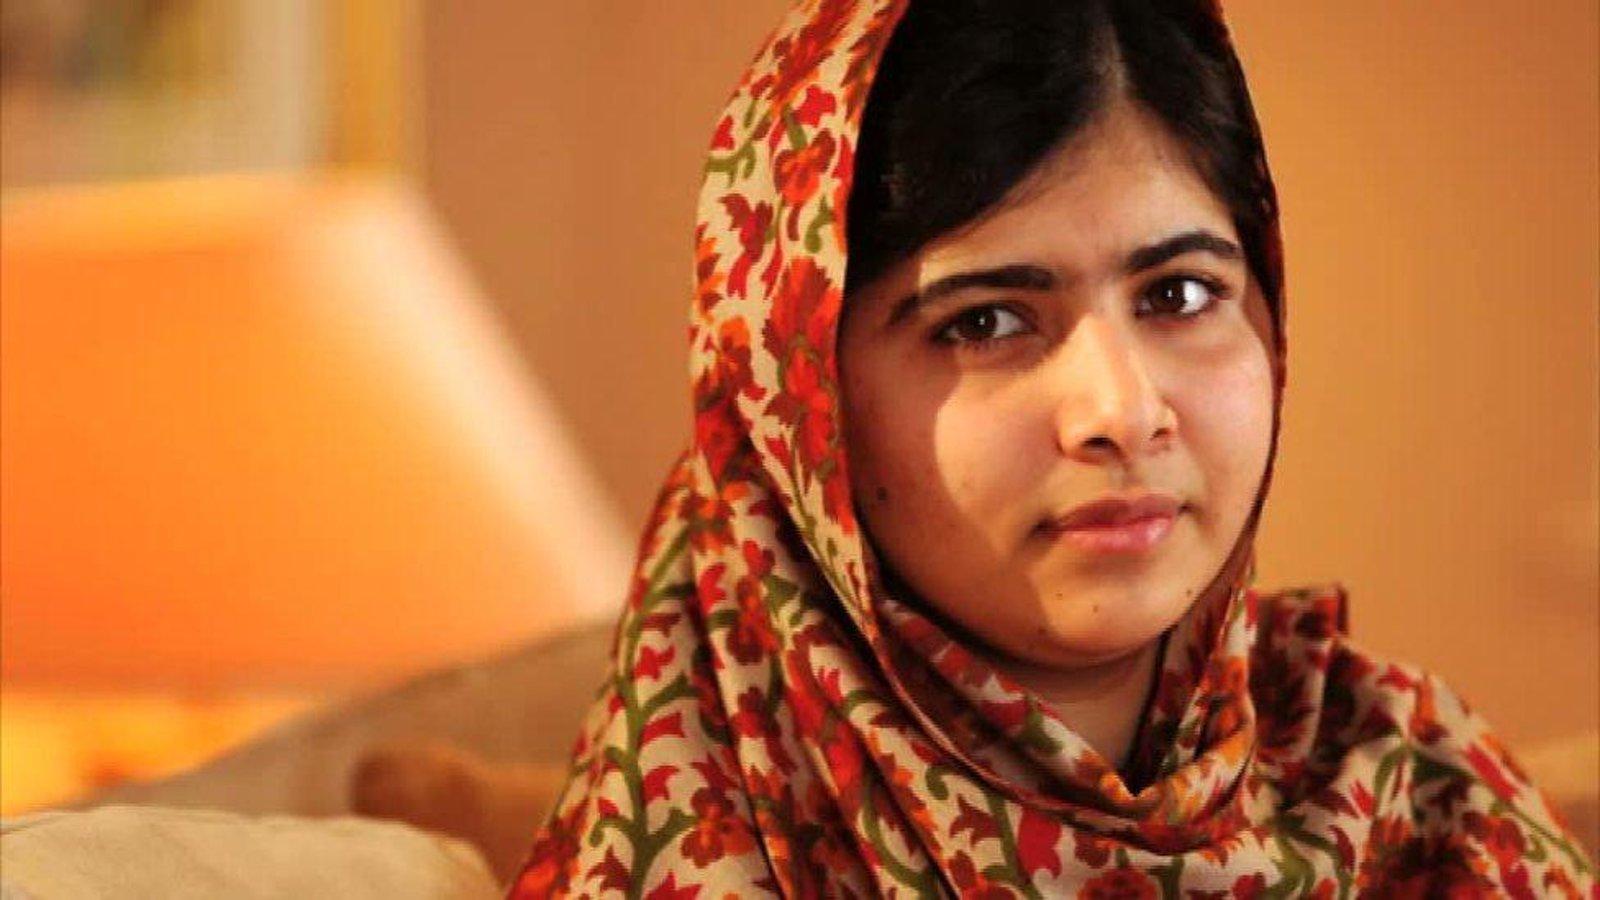 Panorama: Malala - Shot for Going to School